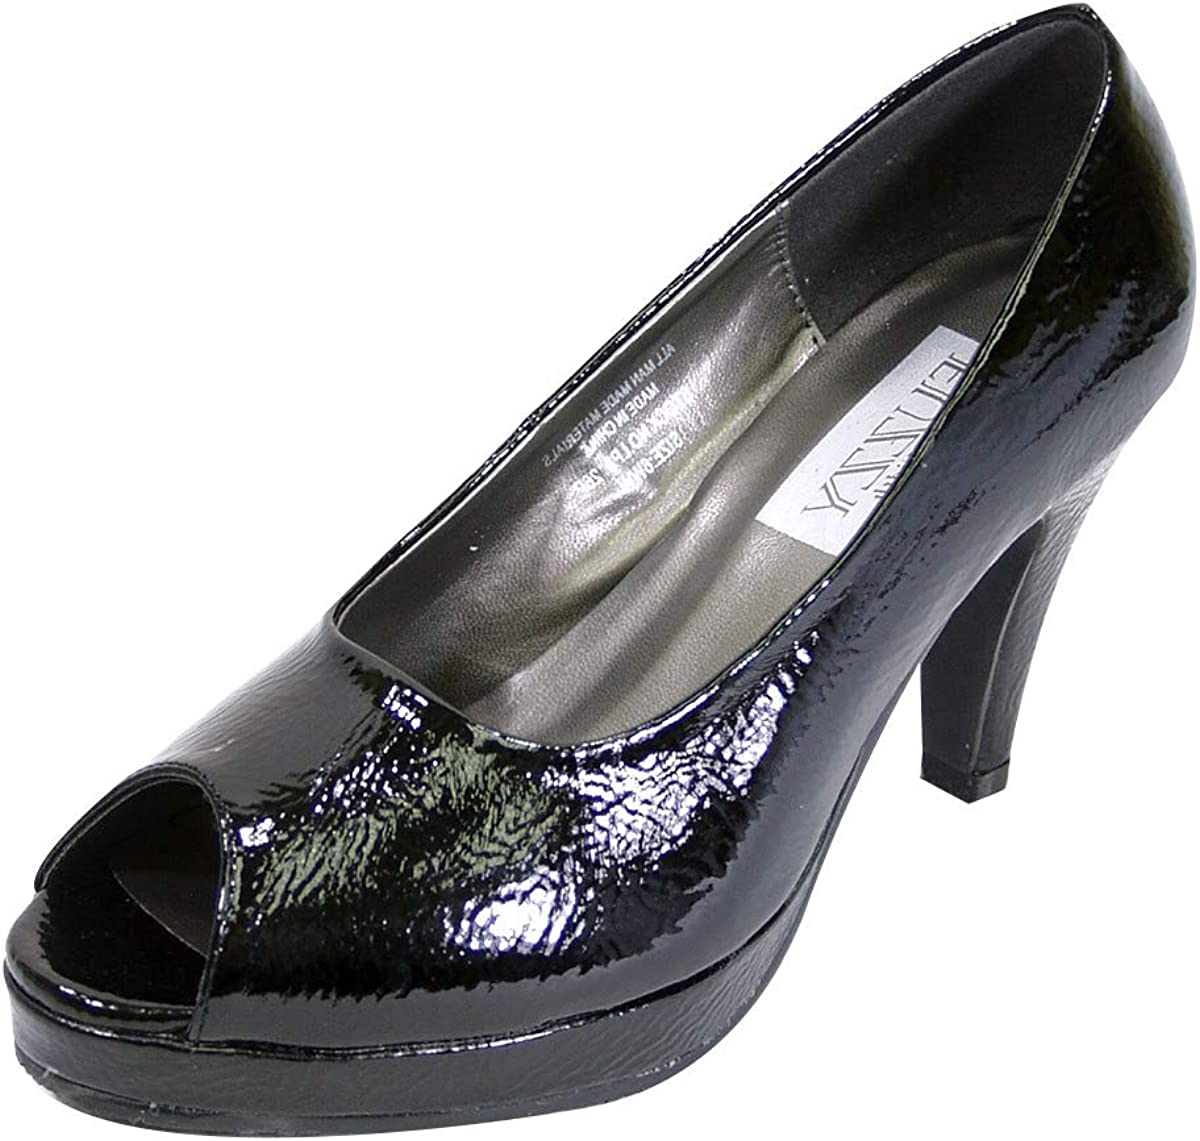 Peerage Ruth Women's Wide Width Leather Platform High Heel Pumps